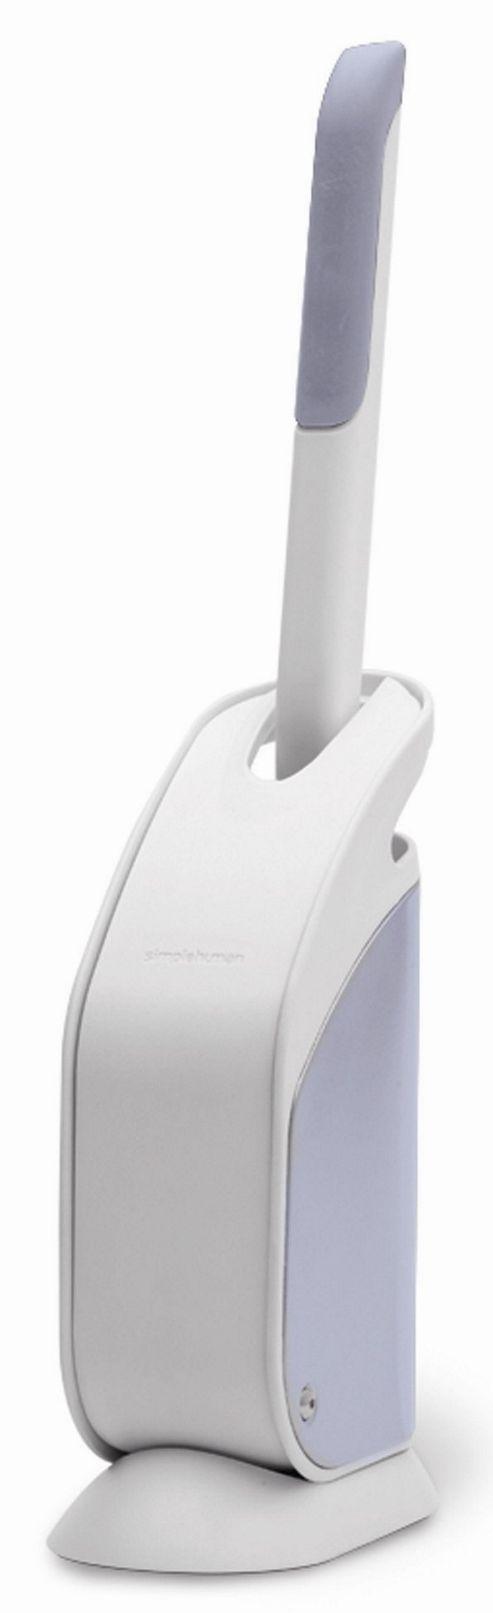 simplehuman Slim Toilet Brush - White